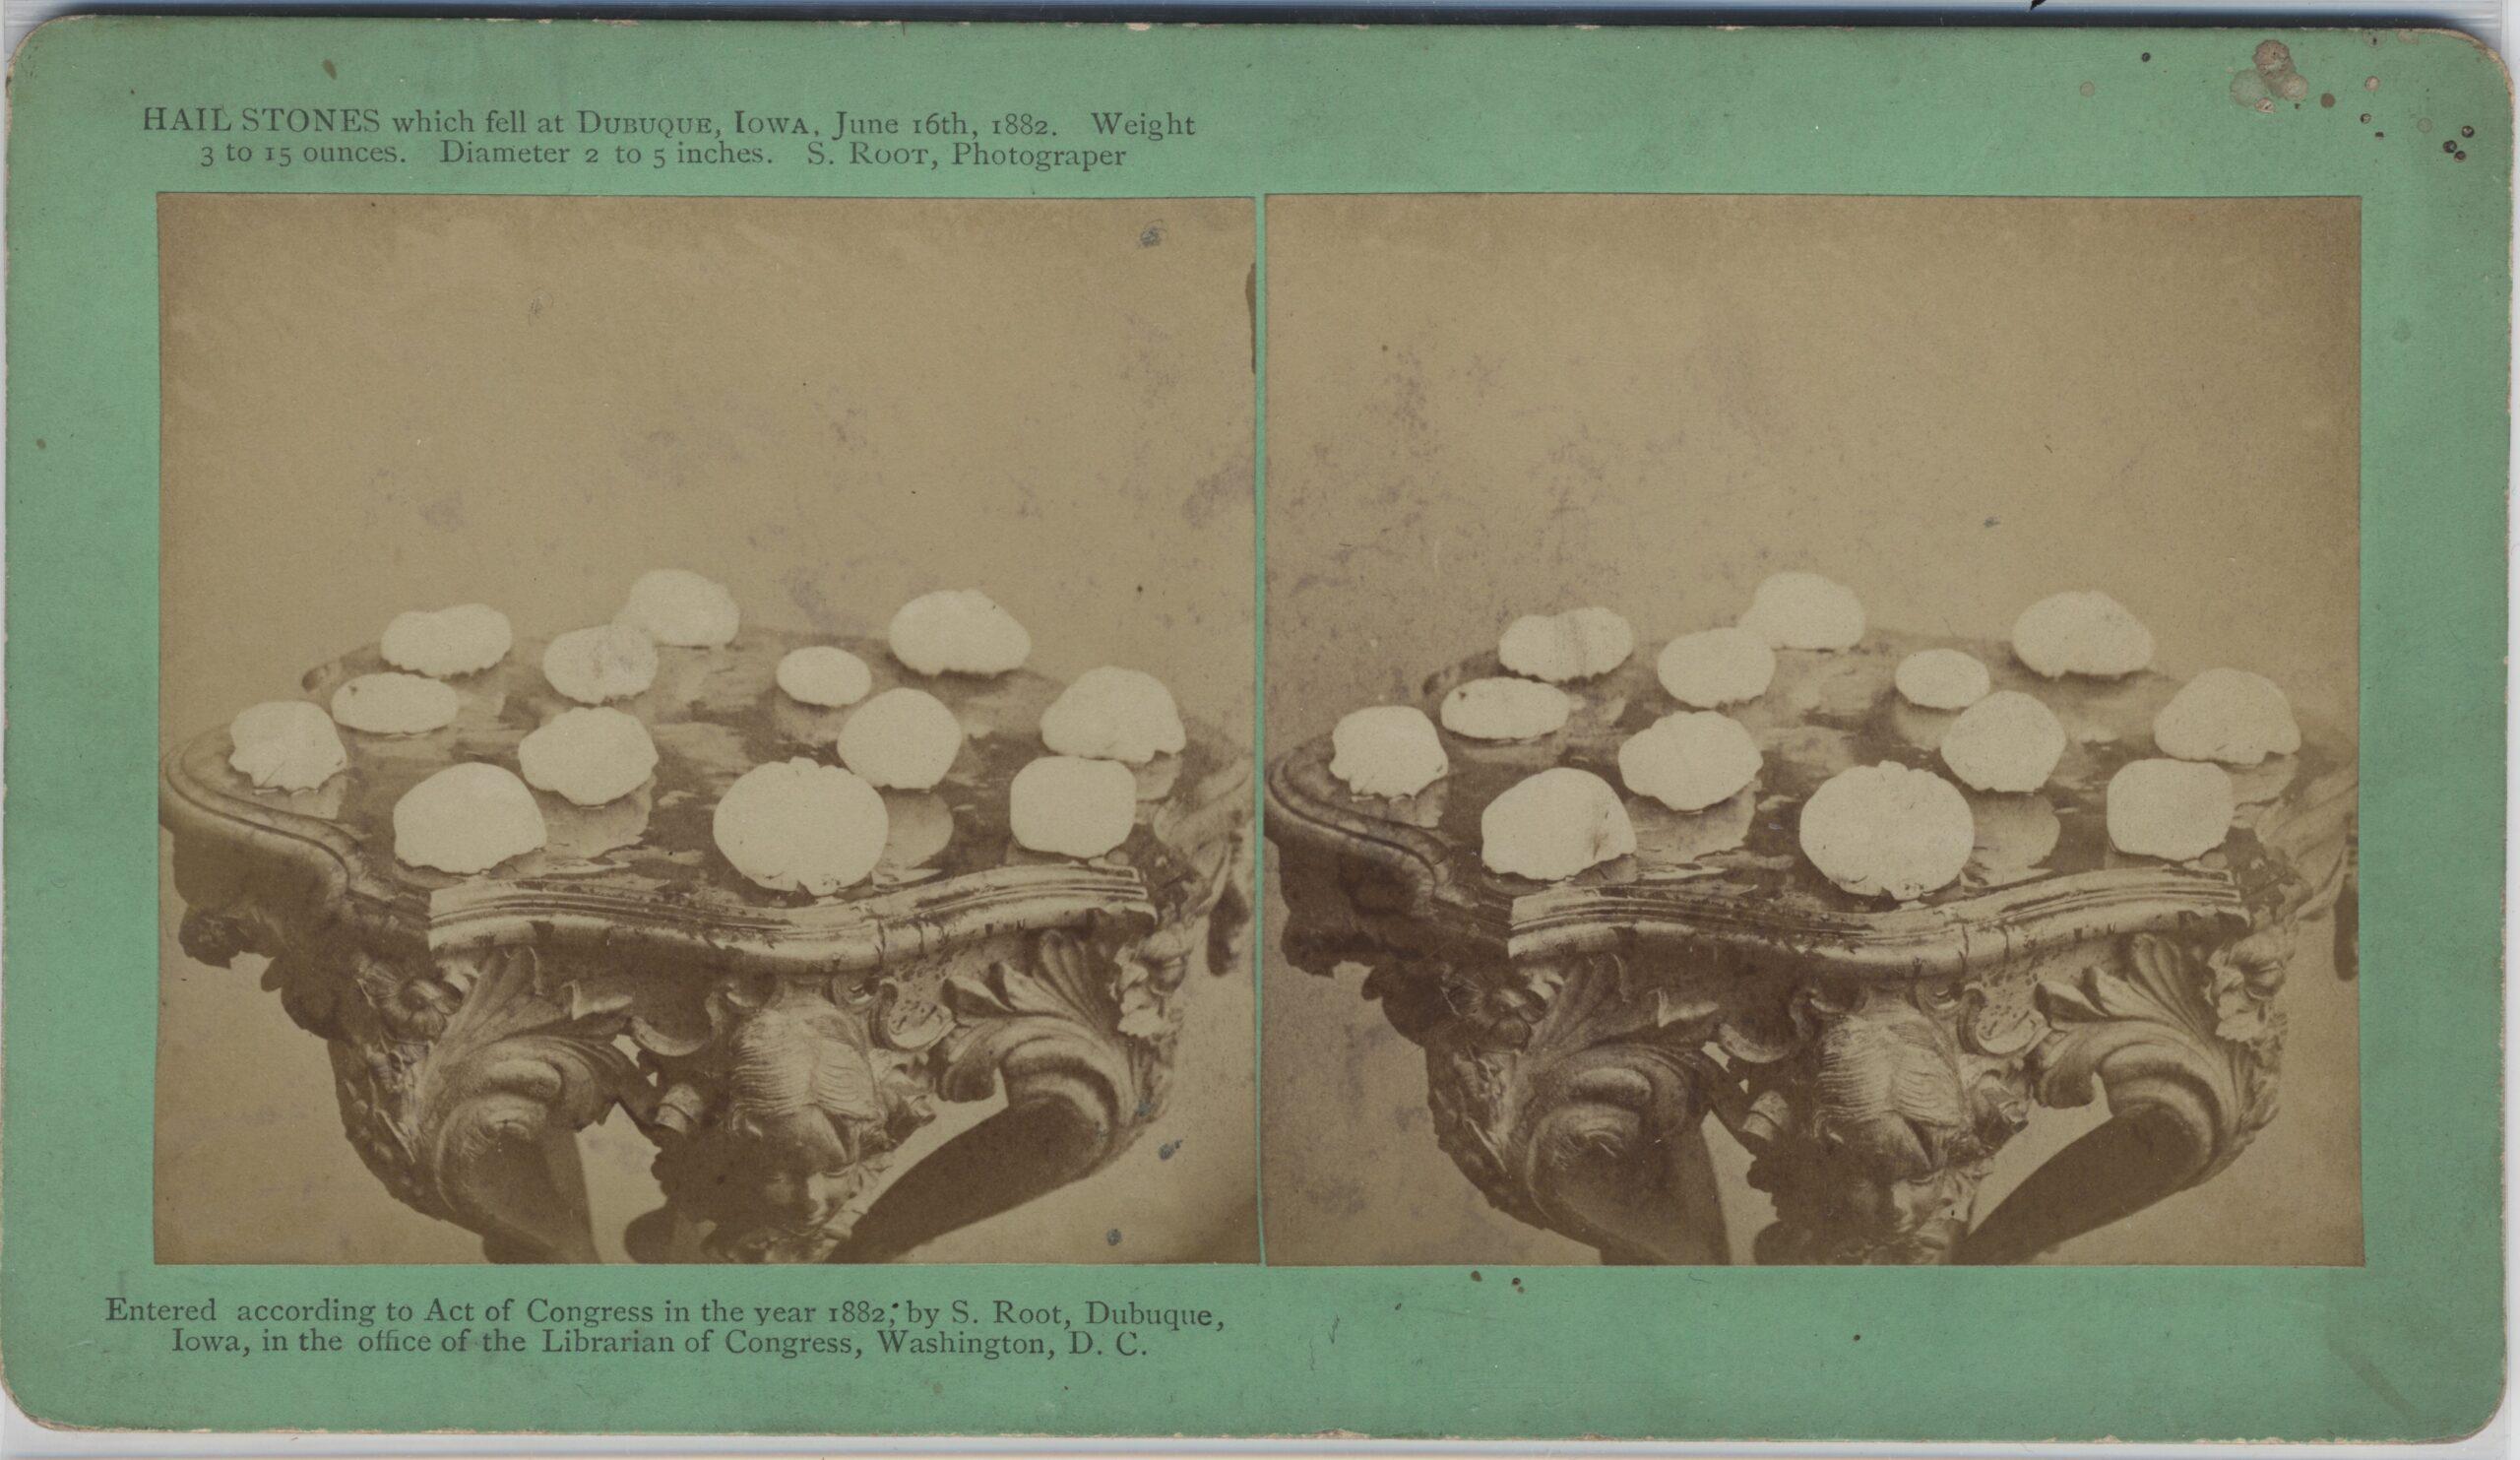 LJTP 100.320 - S. Root - Hail Stones - Jun 16 1882